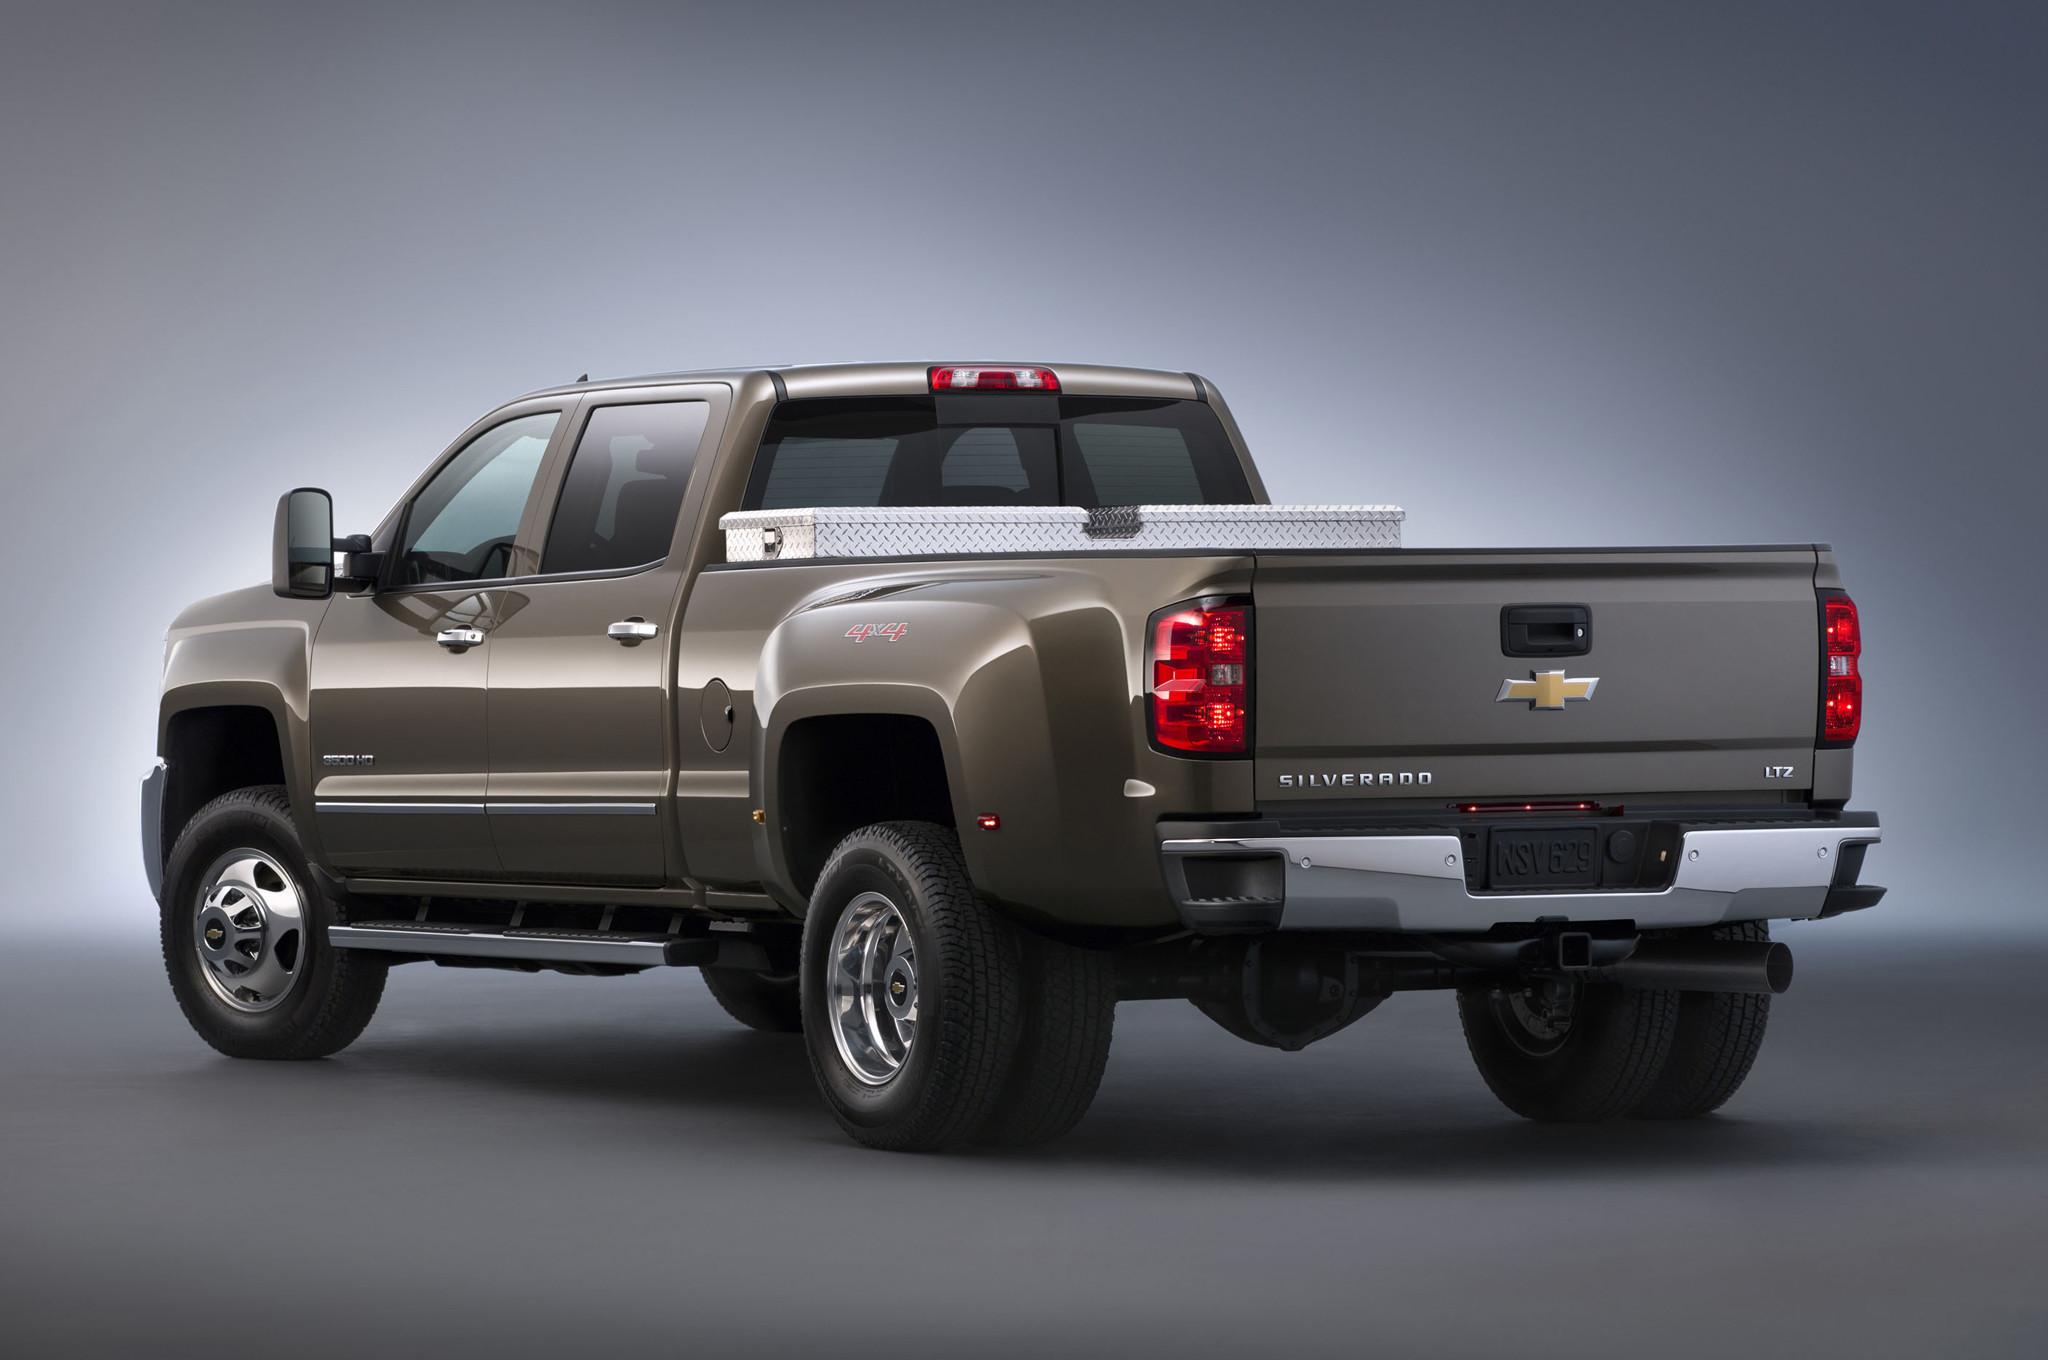 2015 chevy truck | 2015 Chevrolet Silverado HD, 2015 GMC Sierra HD Photo  Gallery